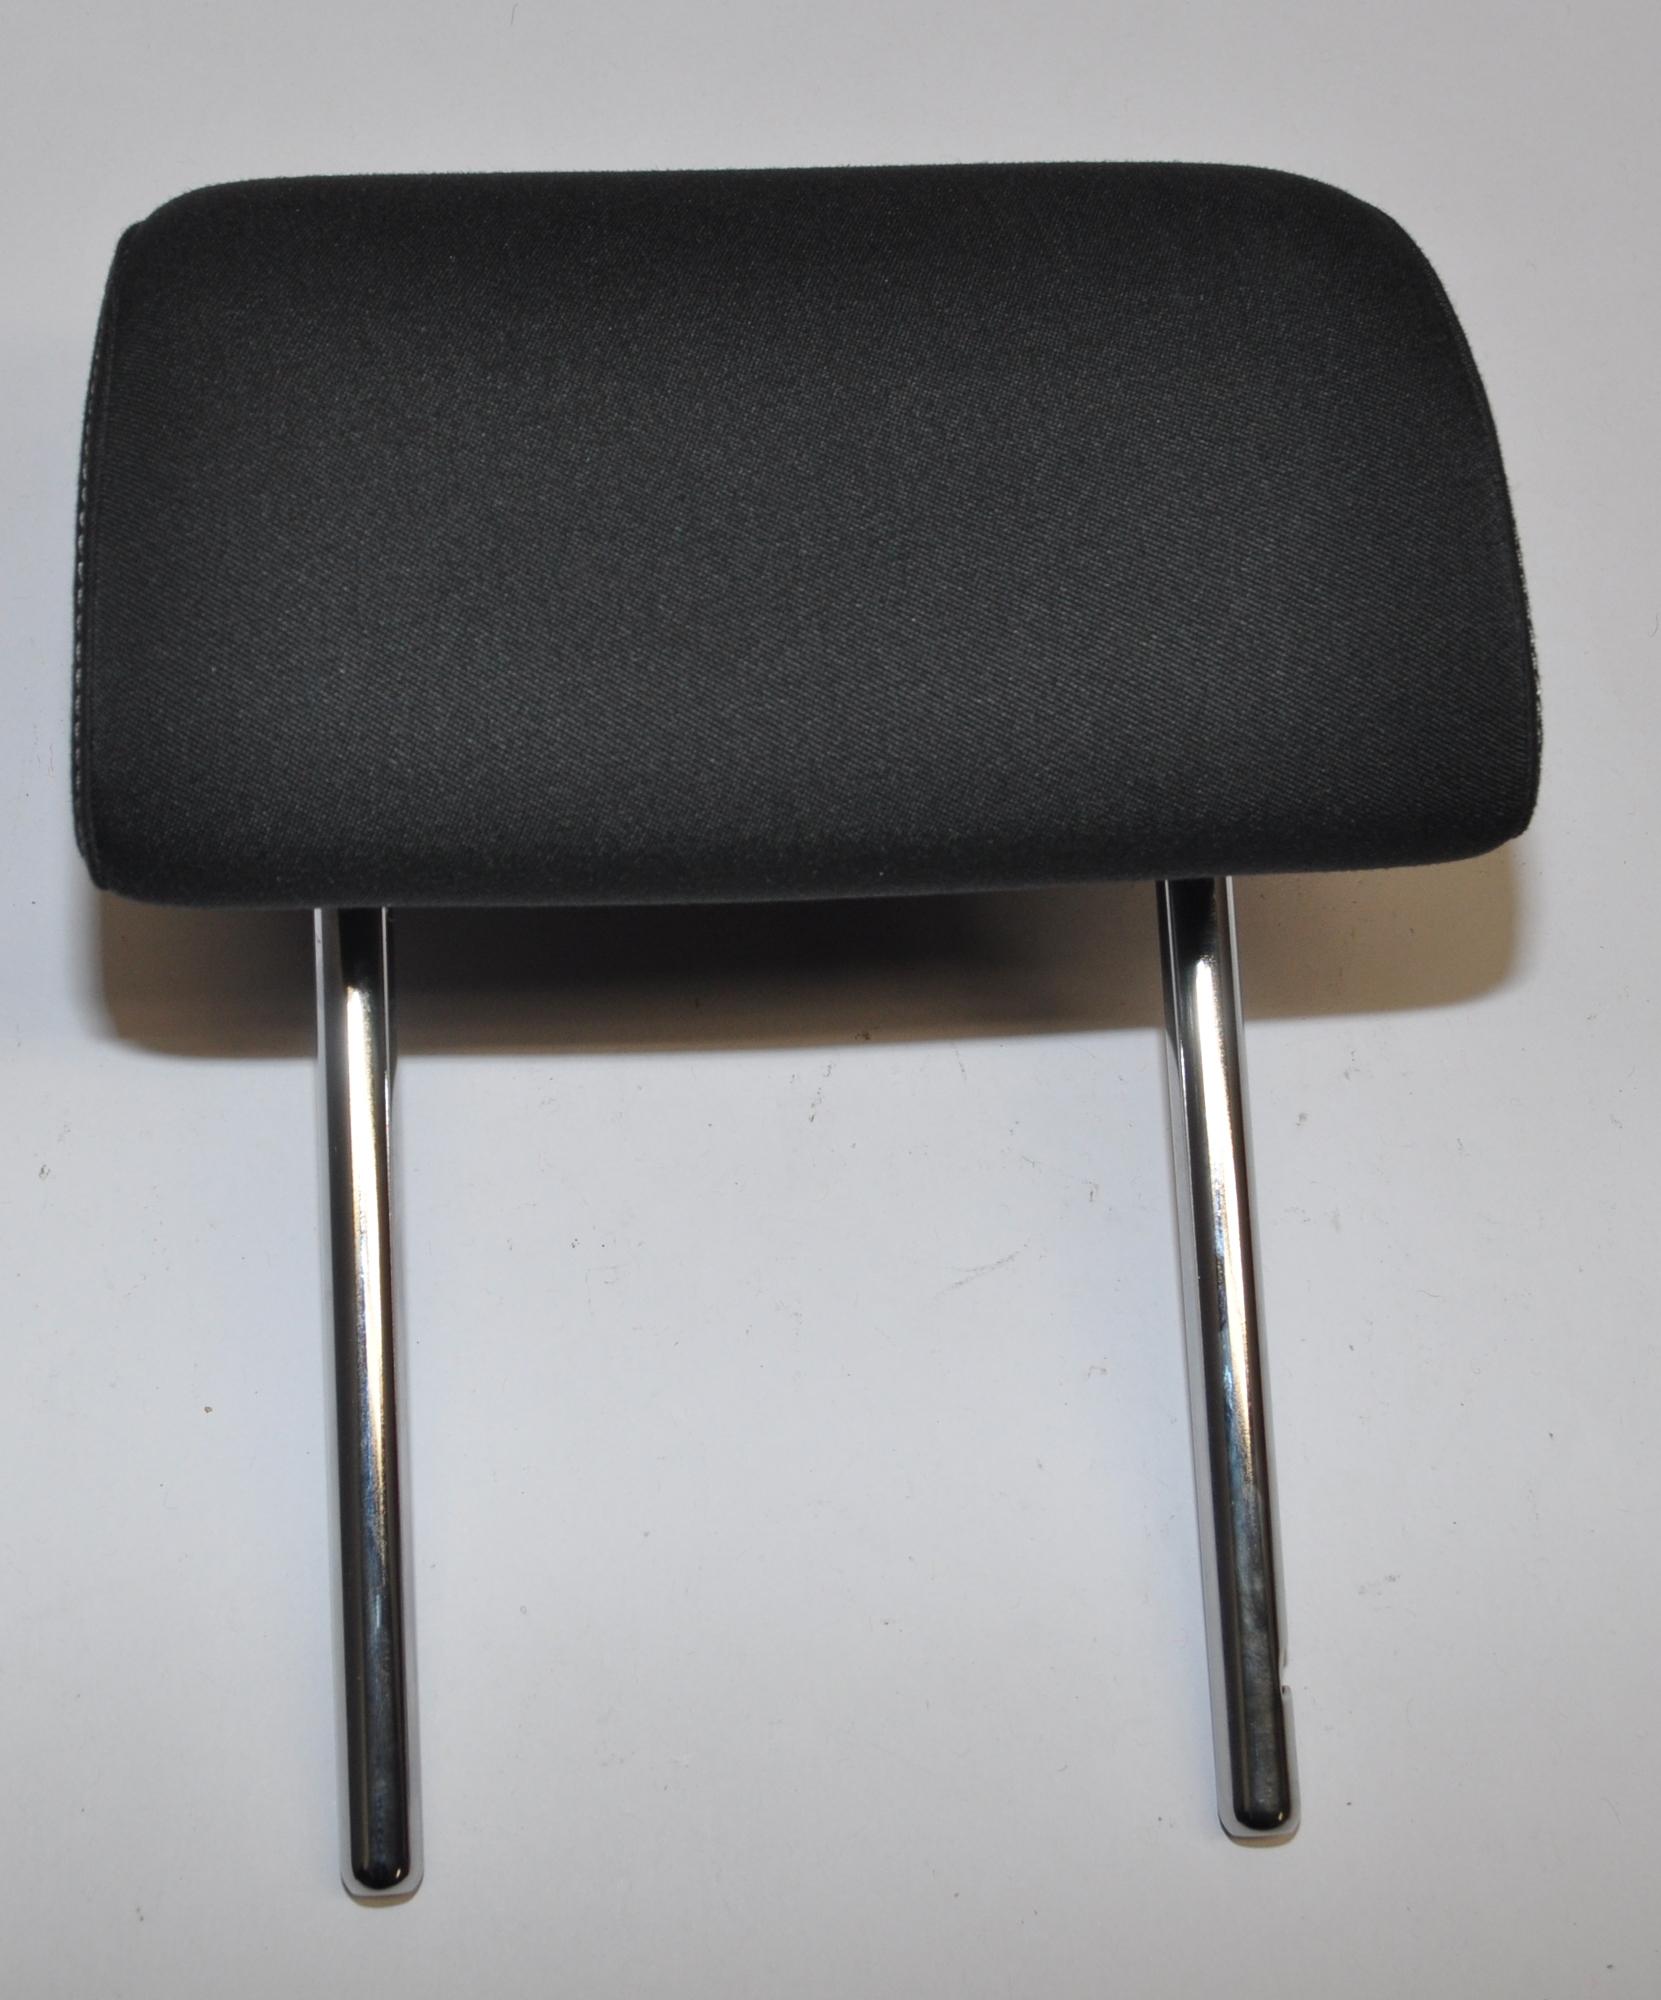 Kopfstütze Nackenstütze Hinten,Mitte 5M0885902AA YYS Golf Plus Original VW